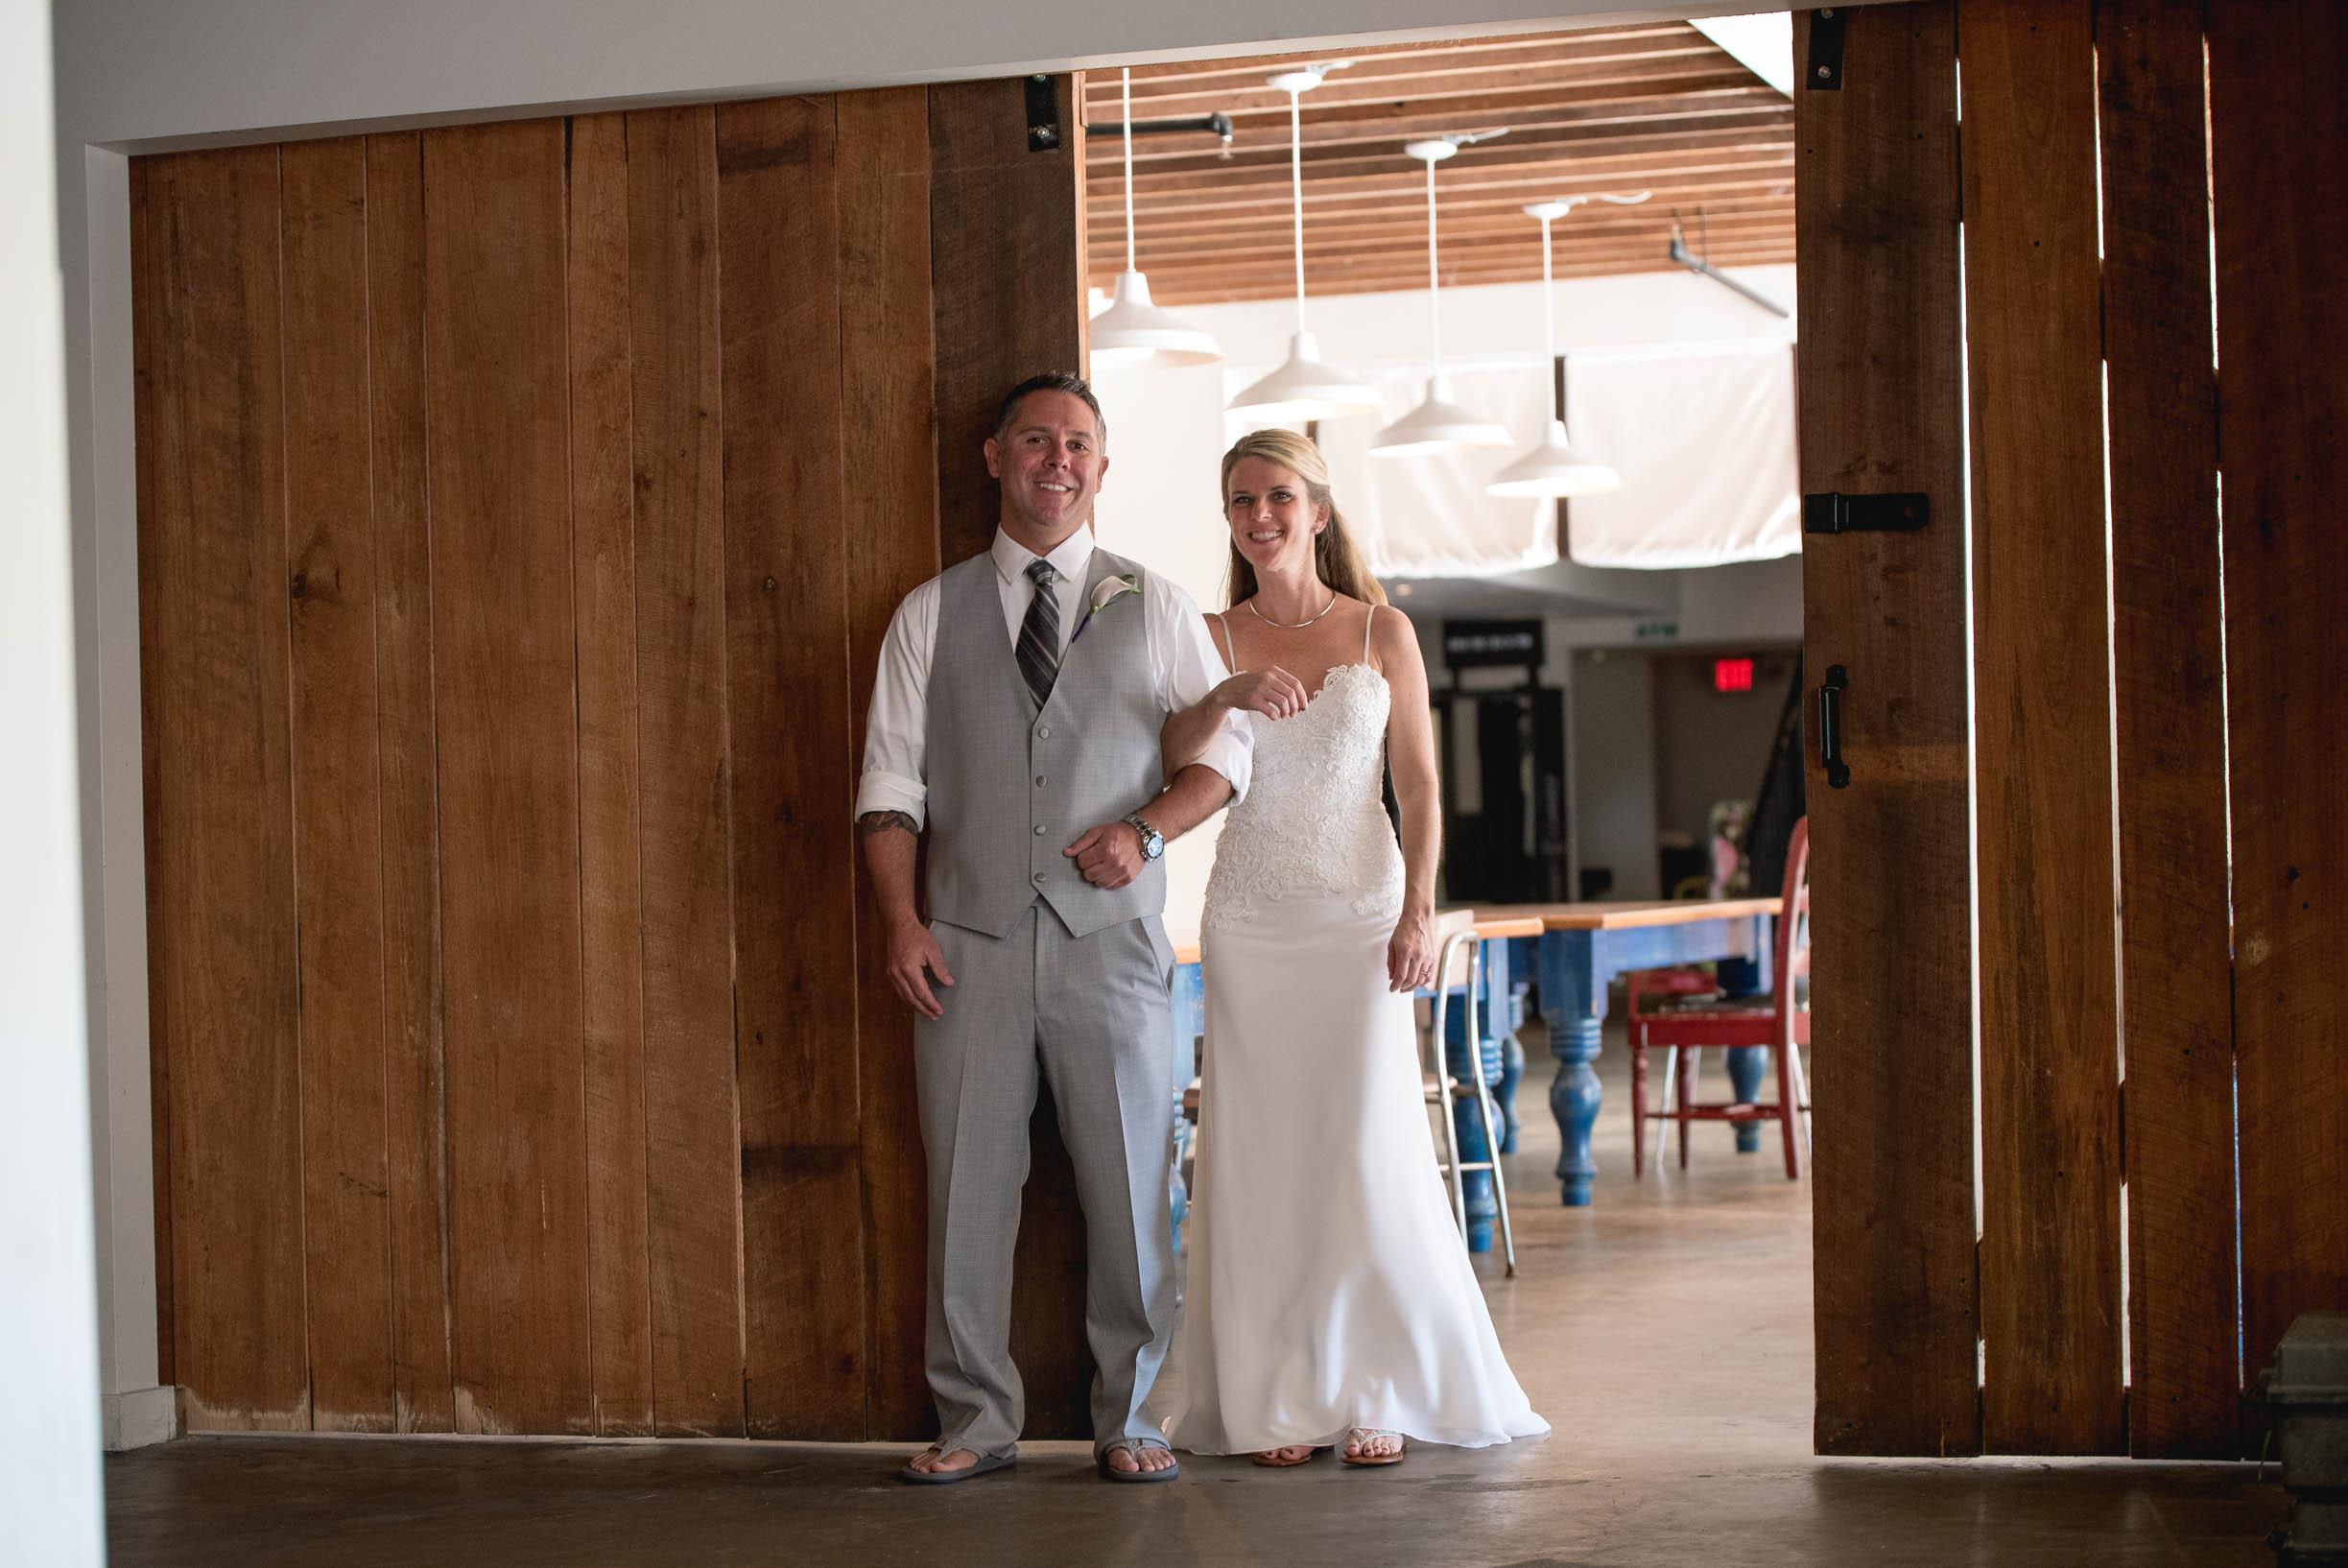 022Portland Wedding Photographer timothy capp.jpg